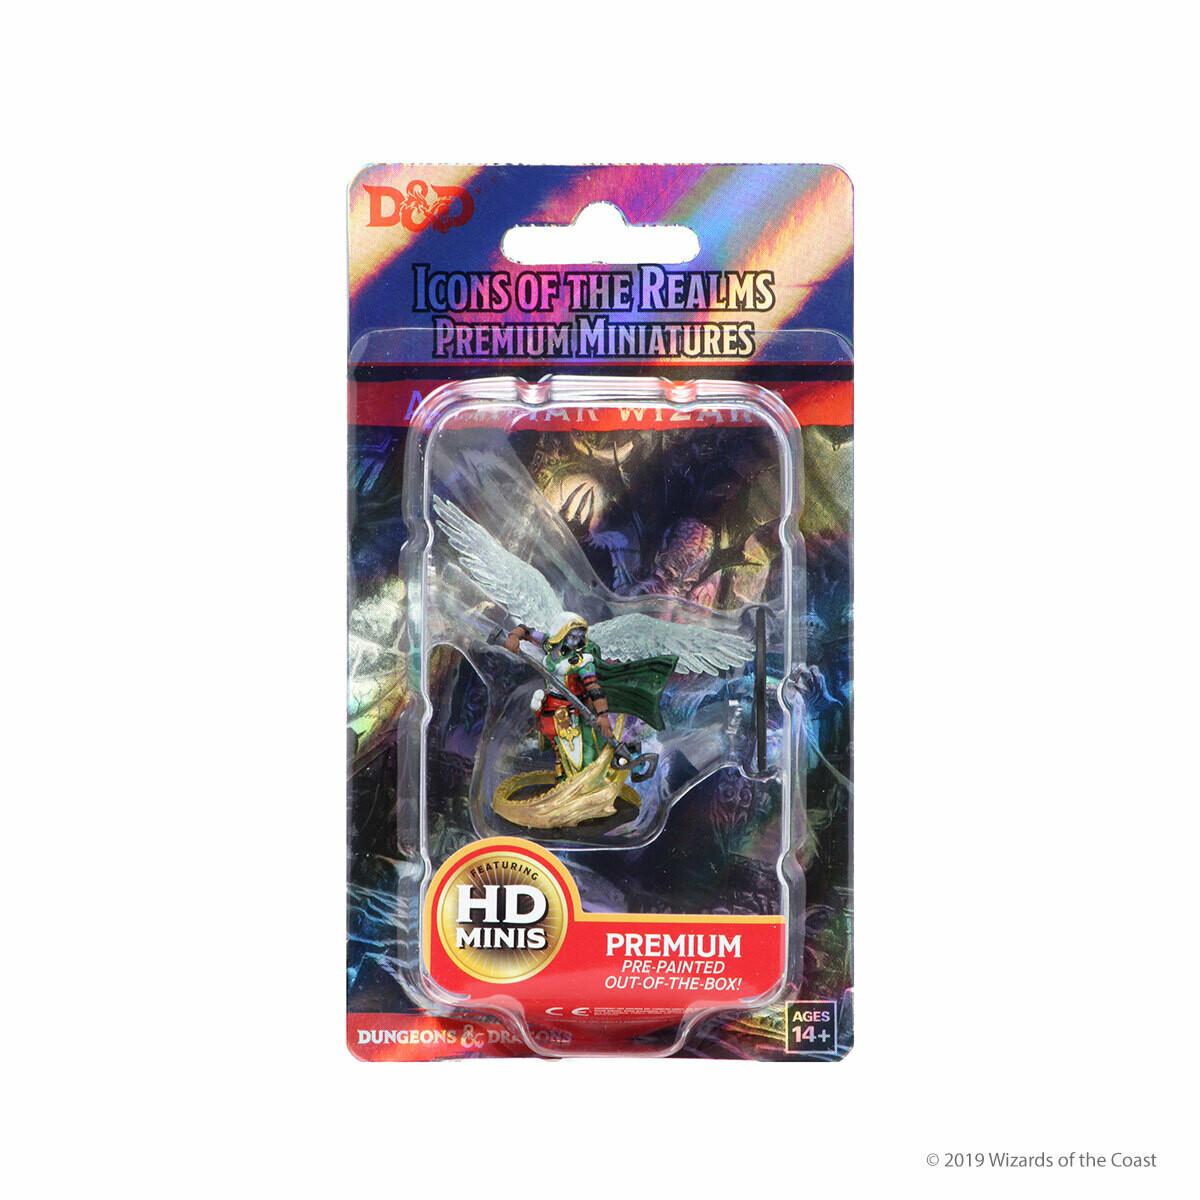 D&D Nolzur's Premium Miniatures - Aasimar Female Wizard (1 Miniatura)